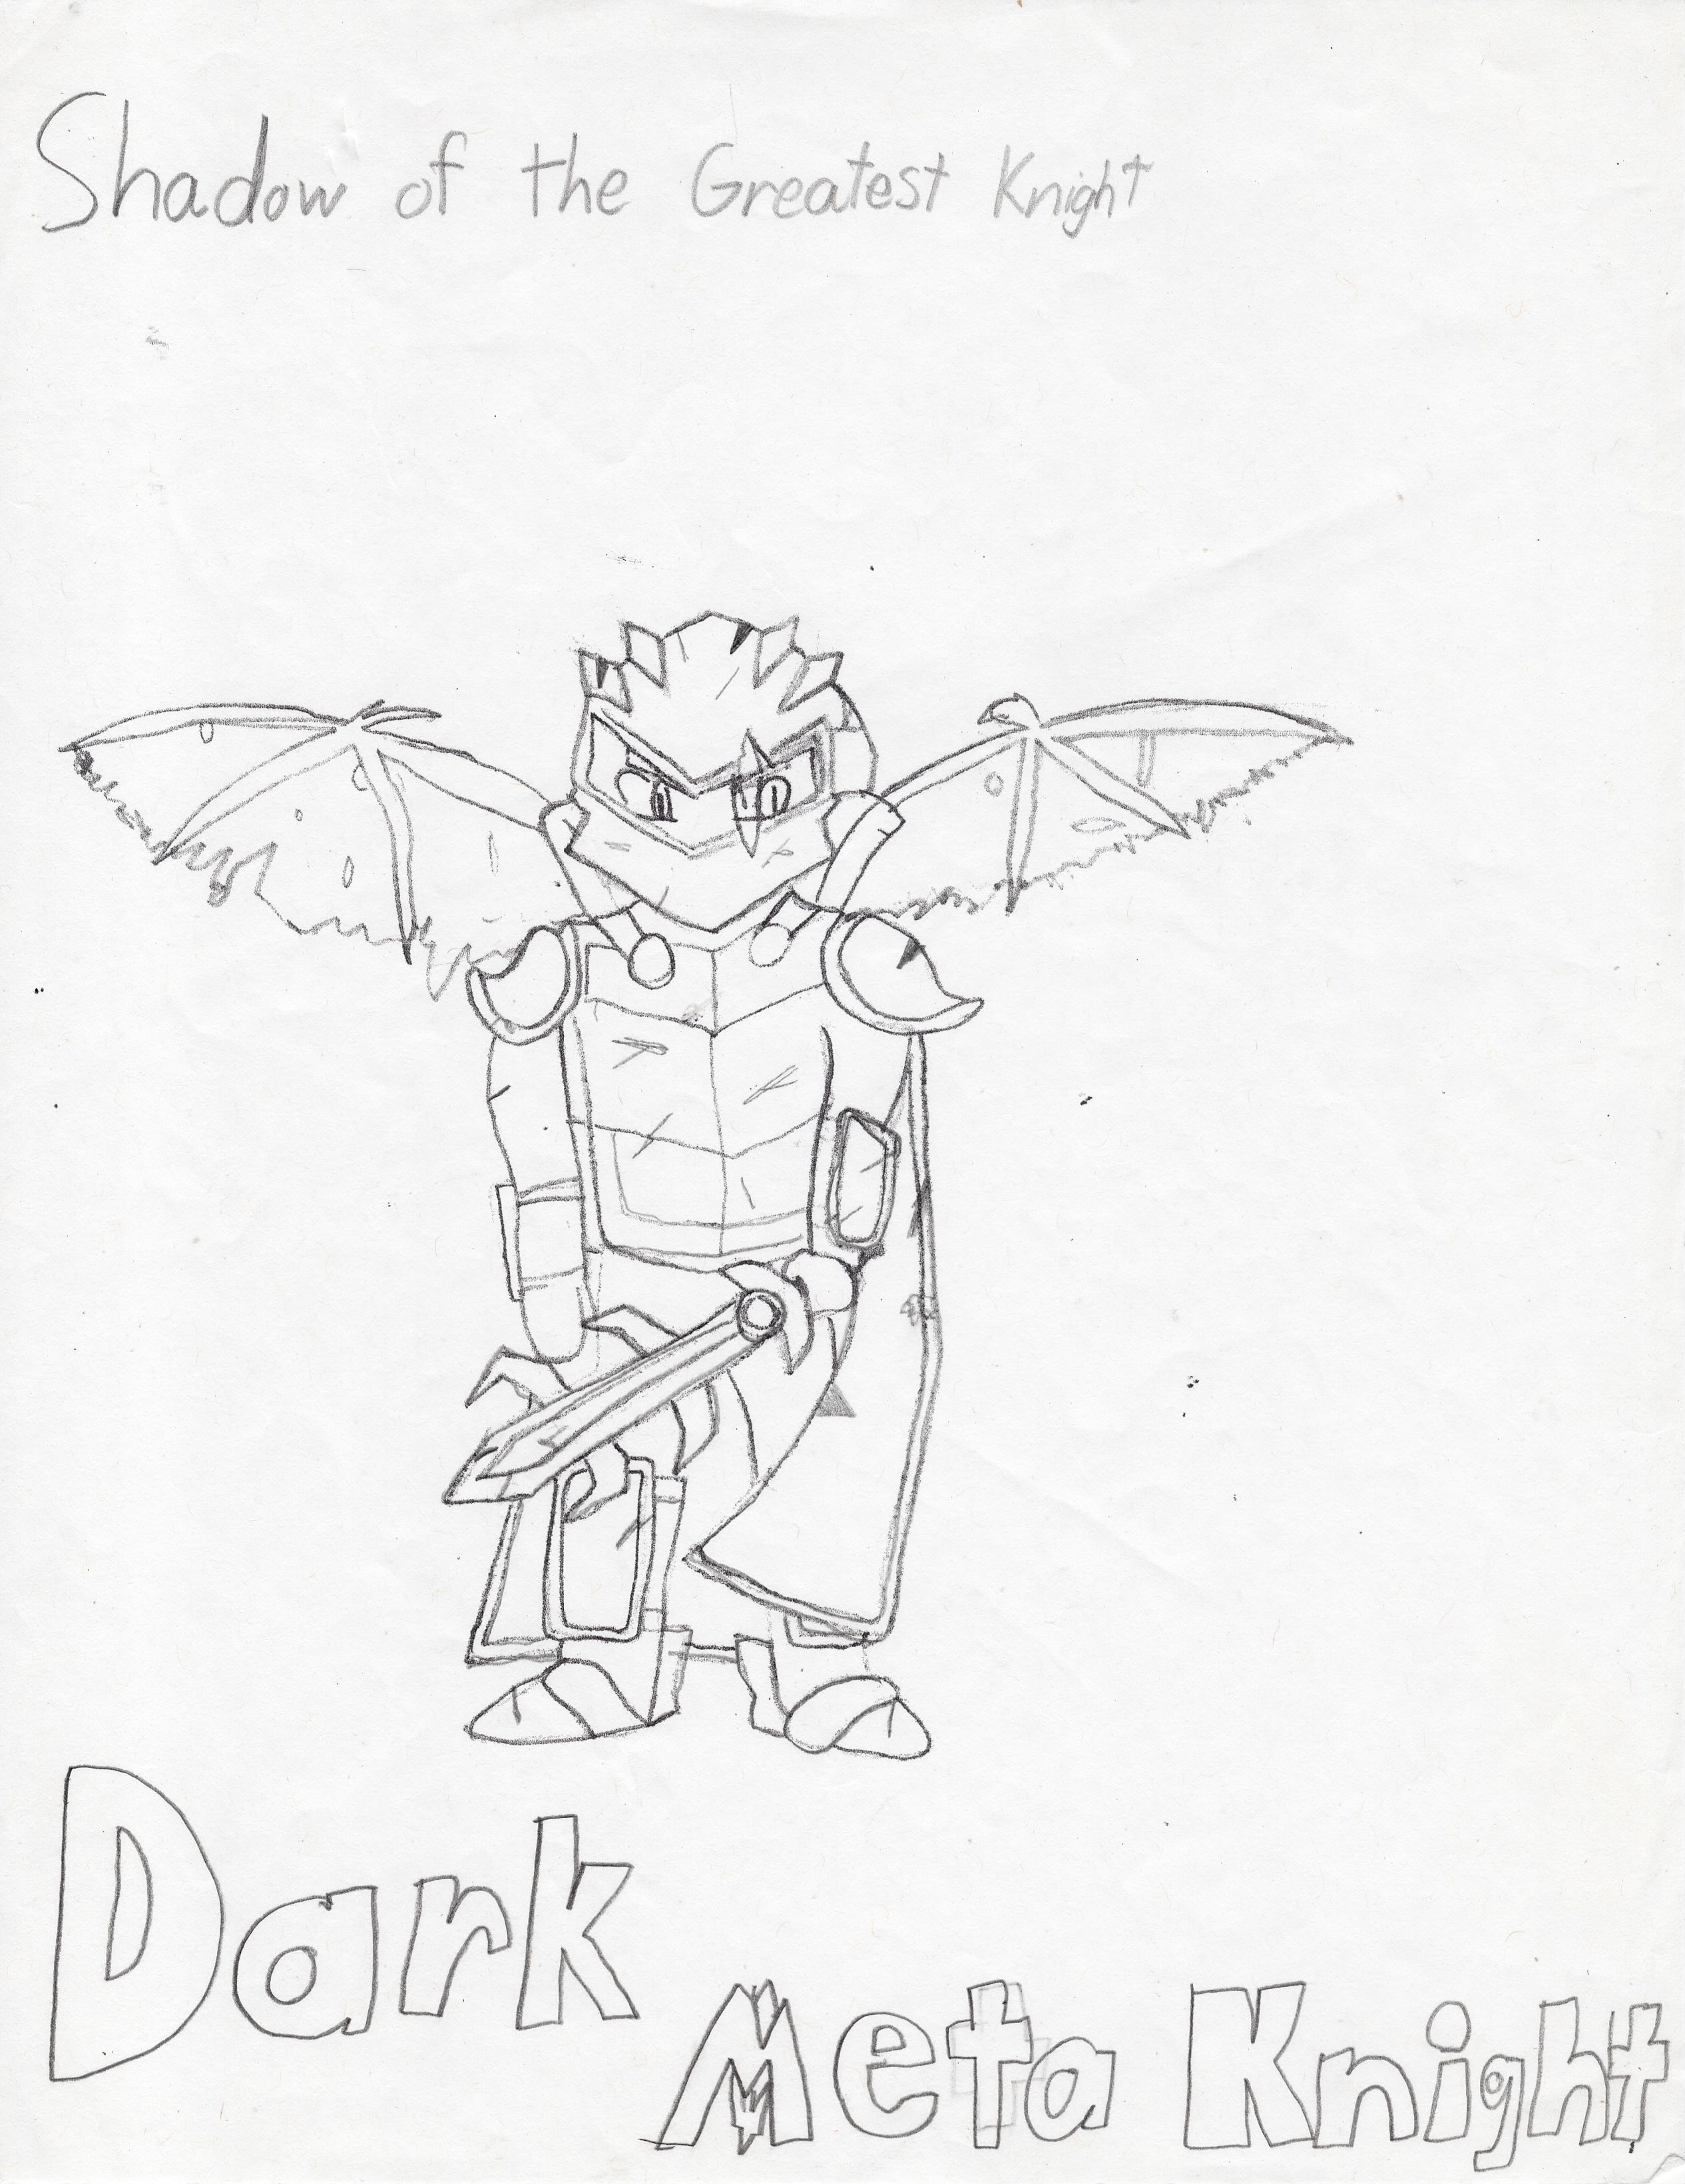 Dark Meta Knight.jpg